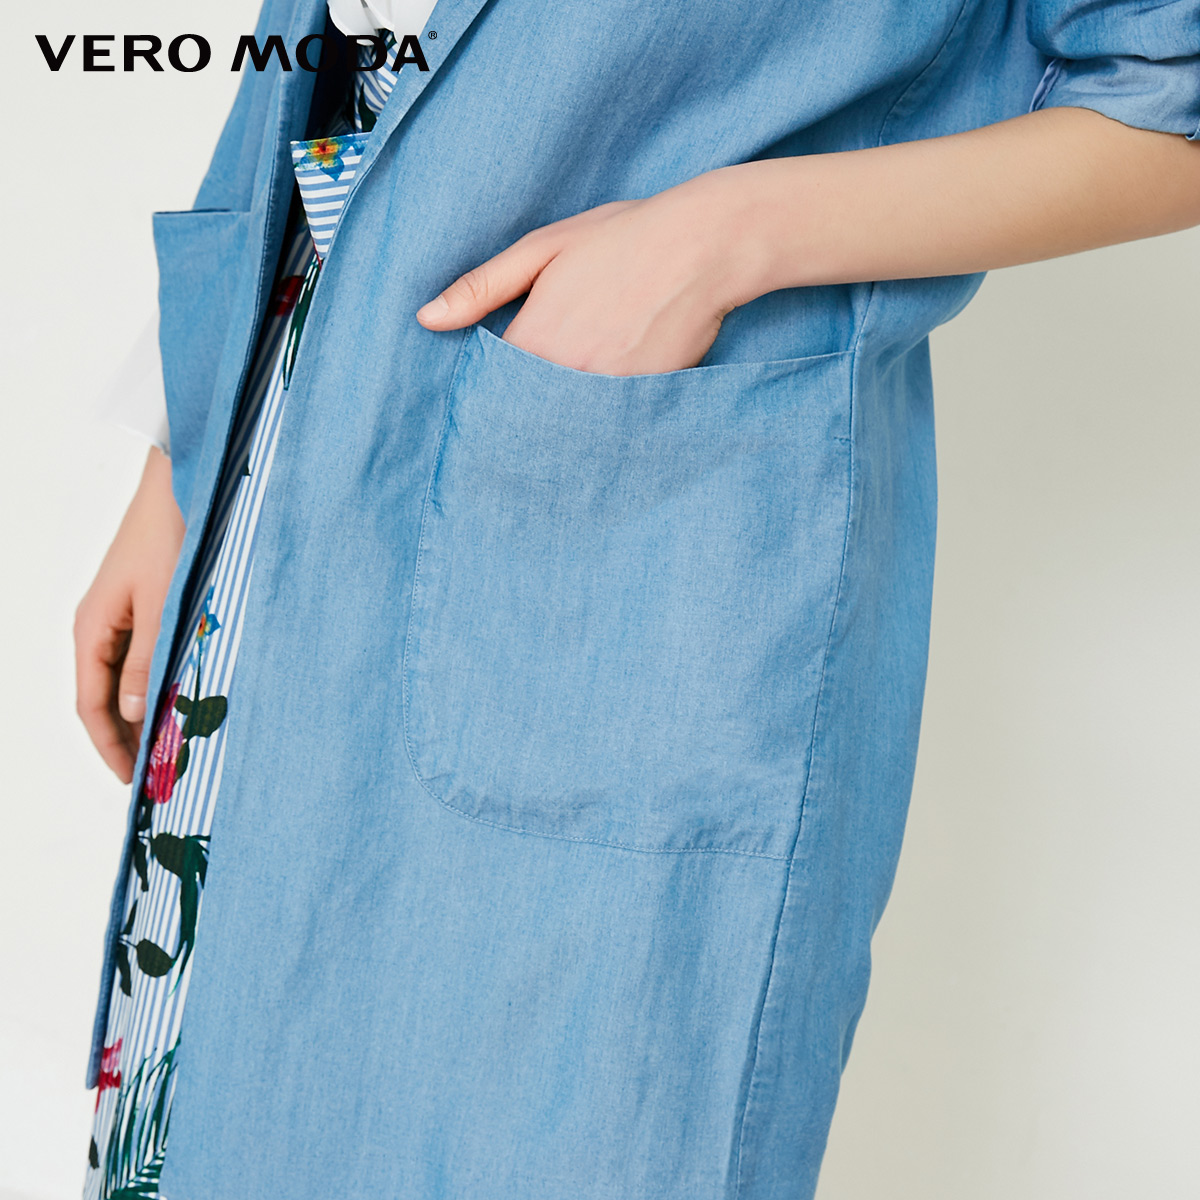 Vero Moda Women's Spring & Summer Long Denim Blazer  318155501